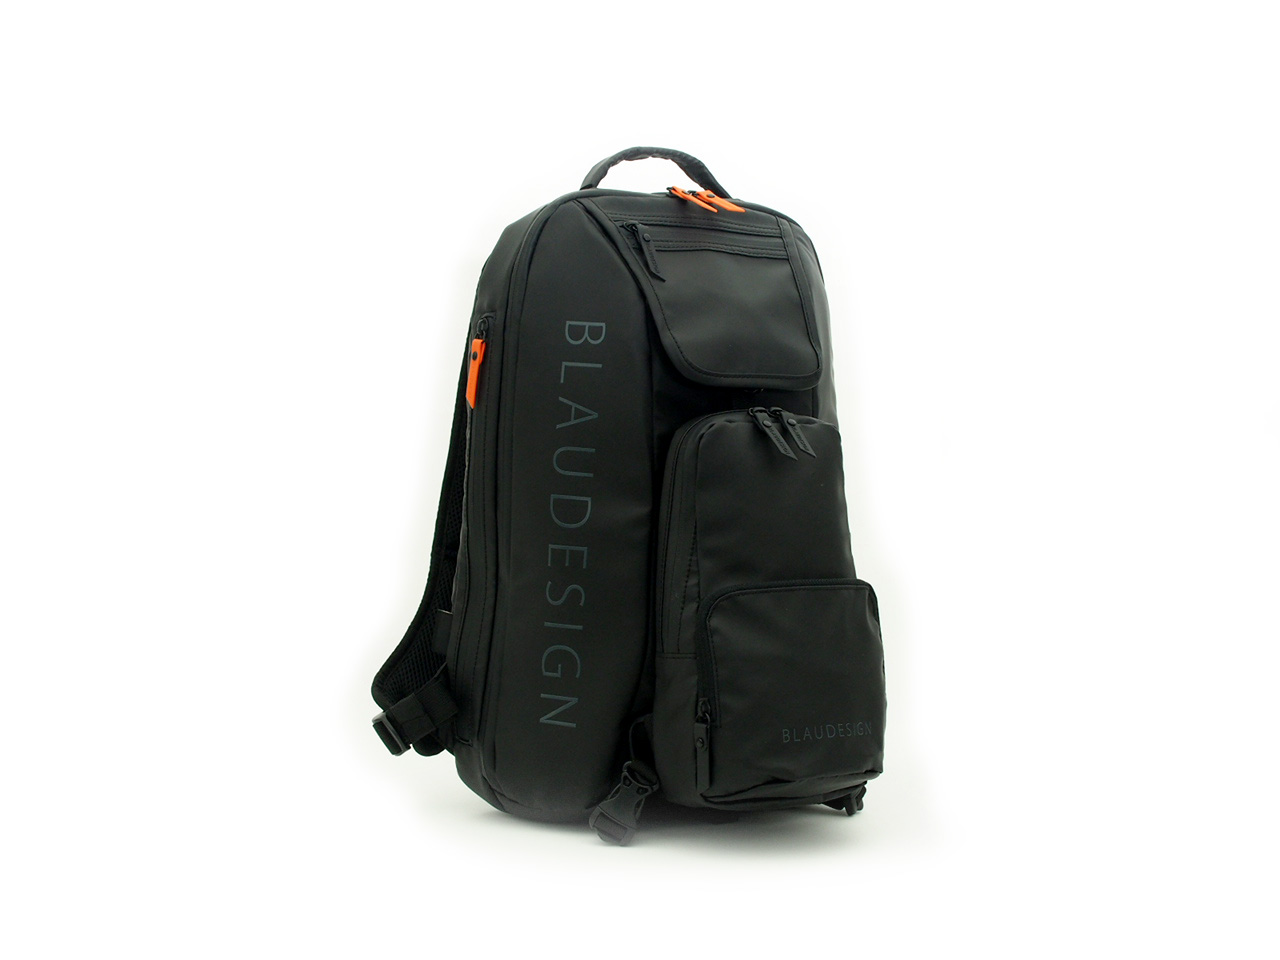 BLAUDESIGN City Tourist ブラウデザイン 3WAY バックパック ブラック 旅行 メンズ 防水 多機能バッグ リュックサック 通勤バックパック ボディバッグ